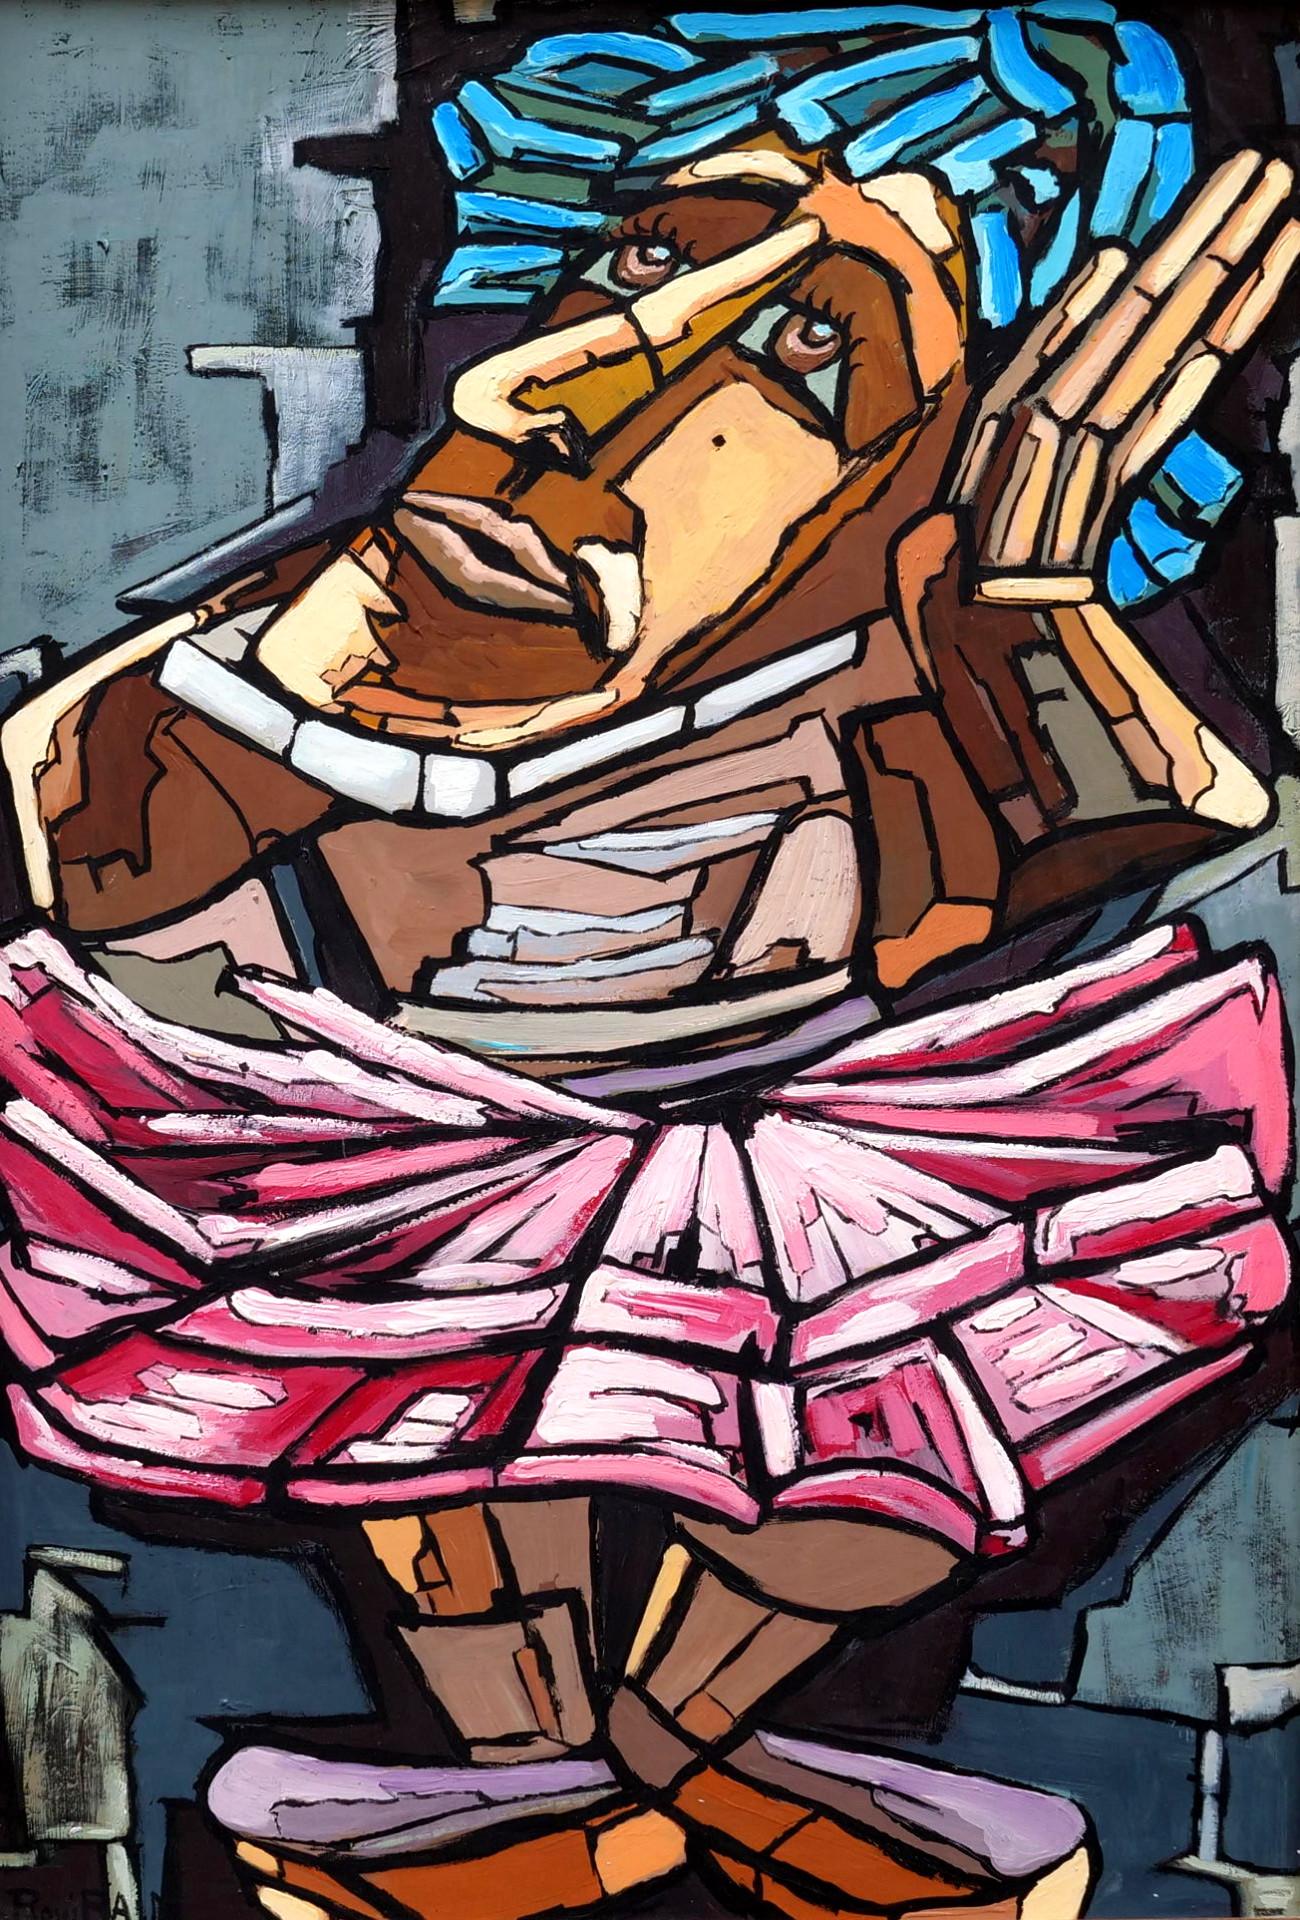 max rovira artiste peintre collioure travesti de la liberté